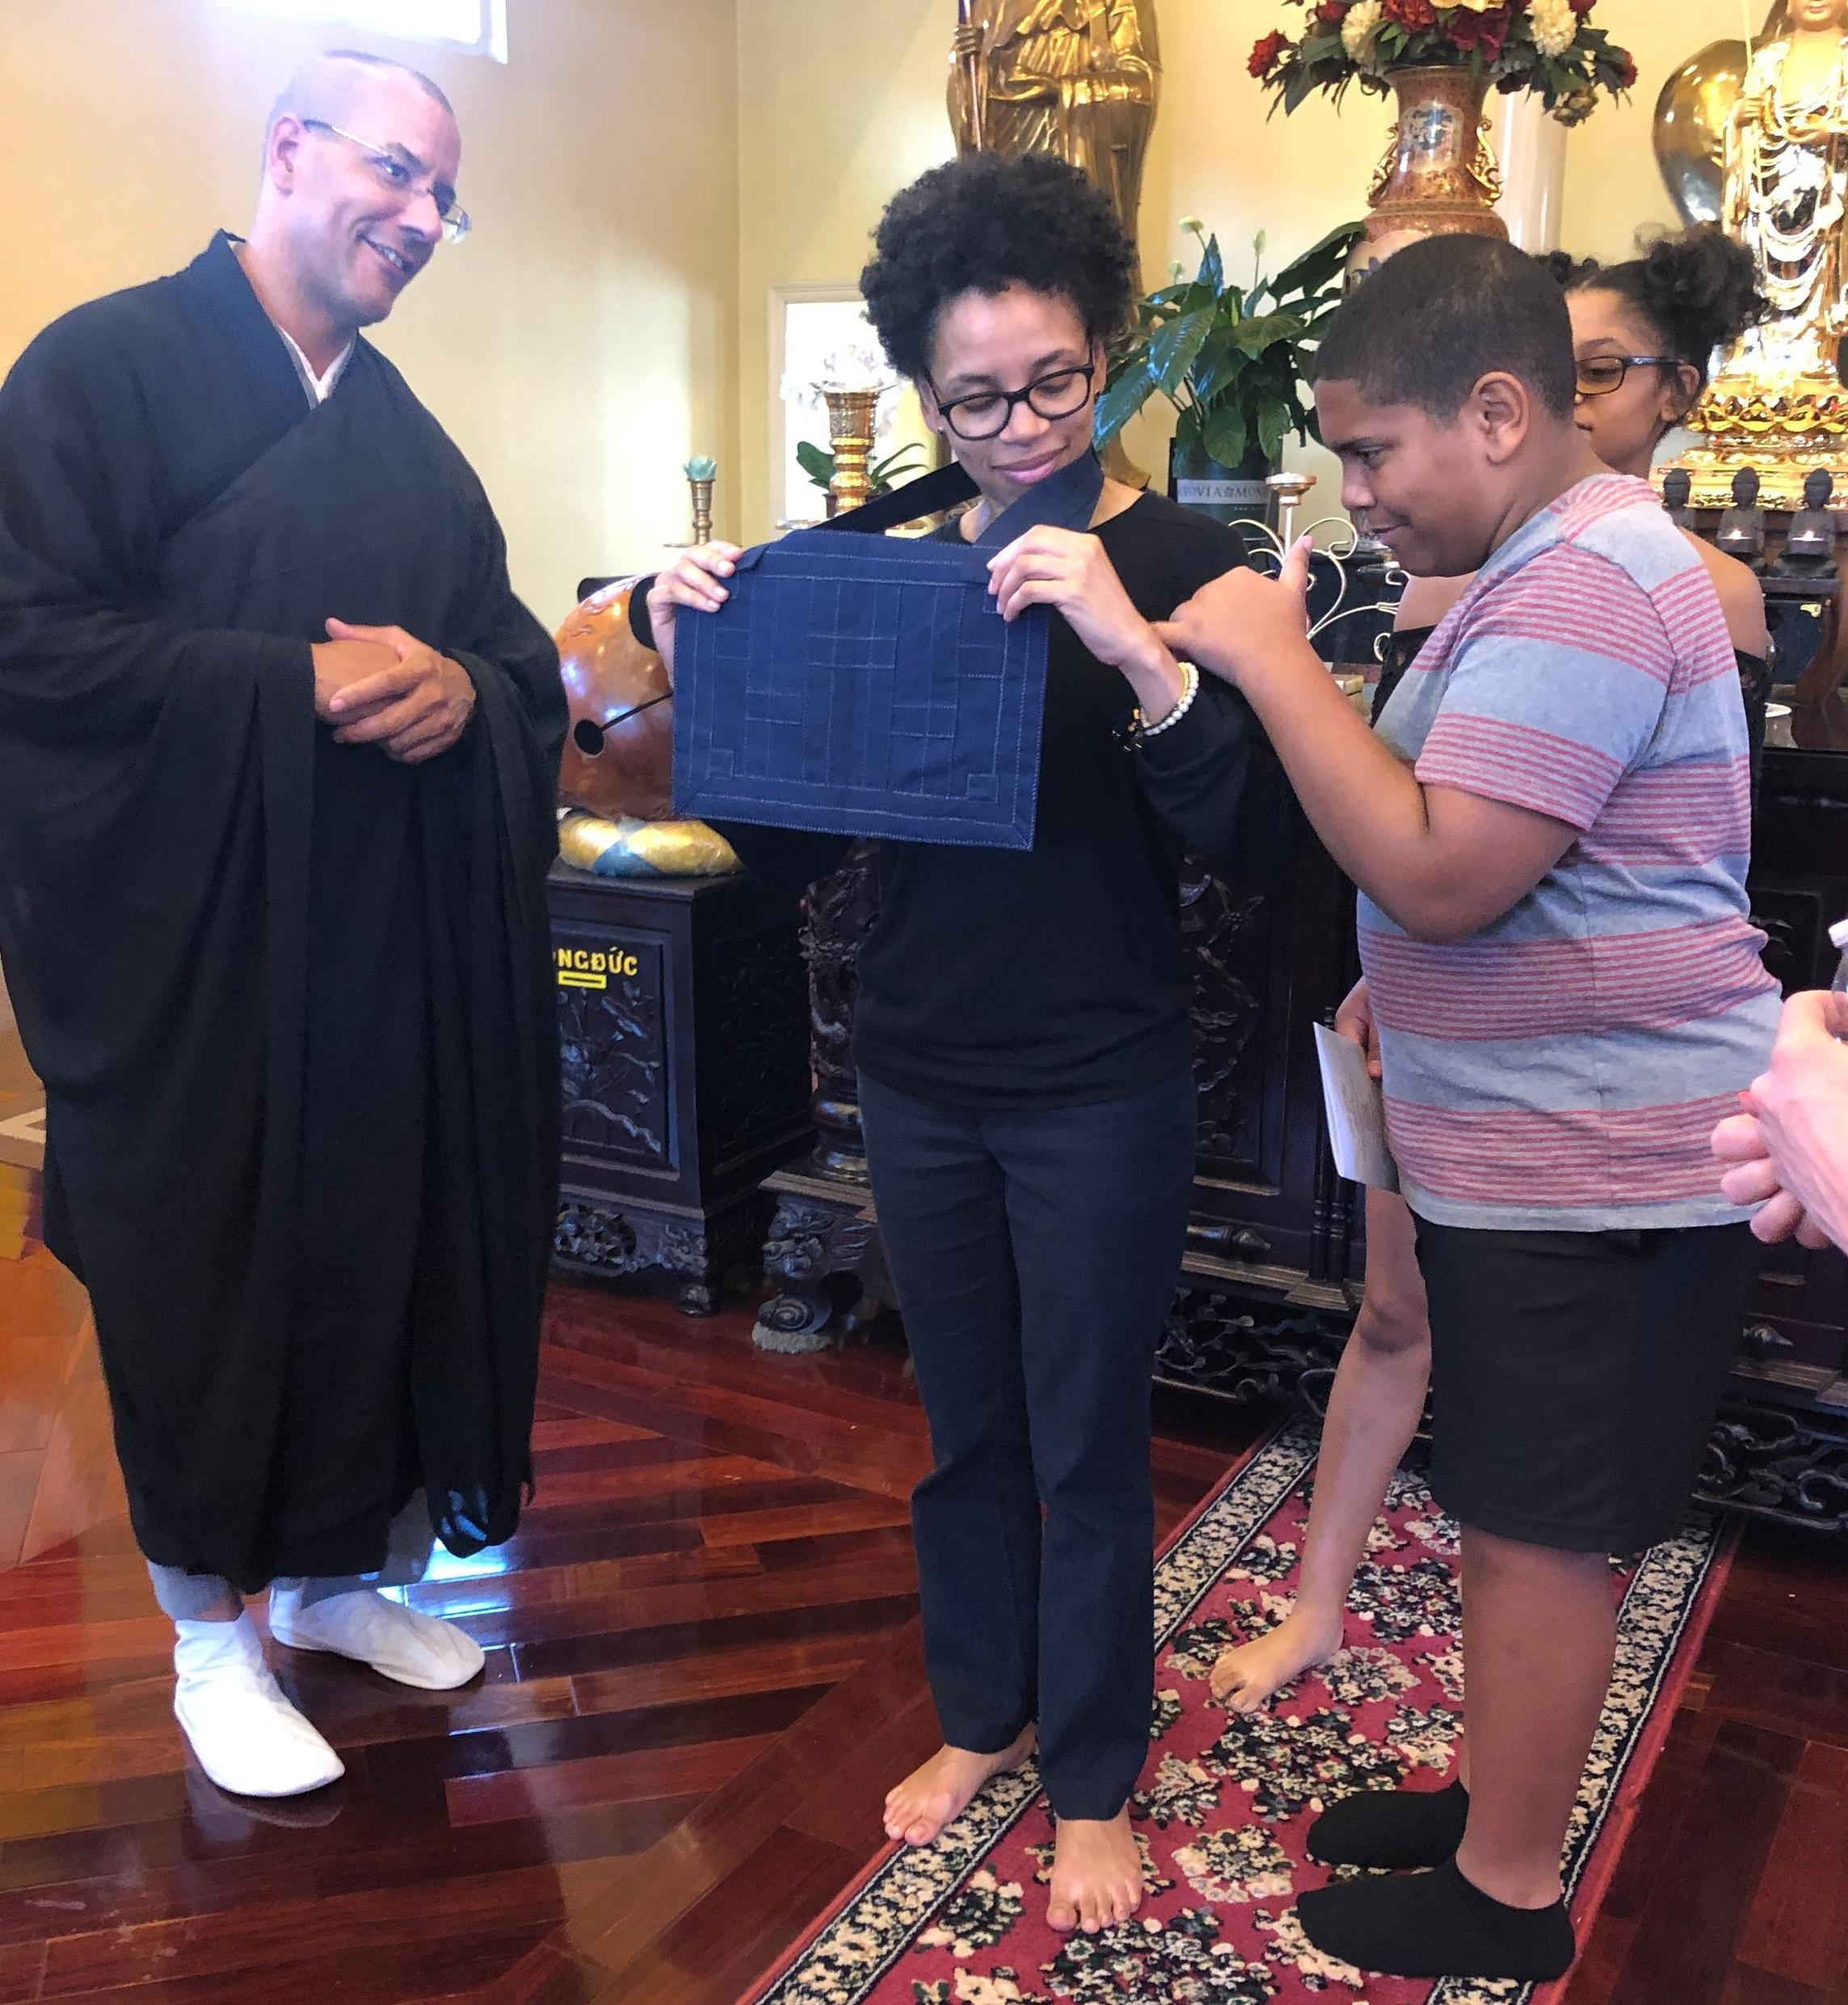 Mom's new rakusu! Rev. Gyōzan Johnson, Bright Lotus Asiyah Hankins and two of her children.